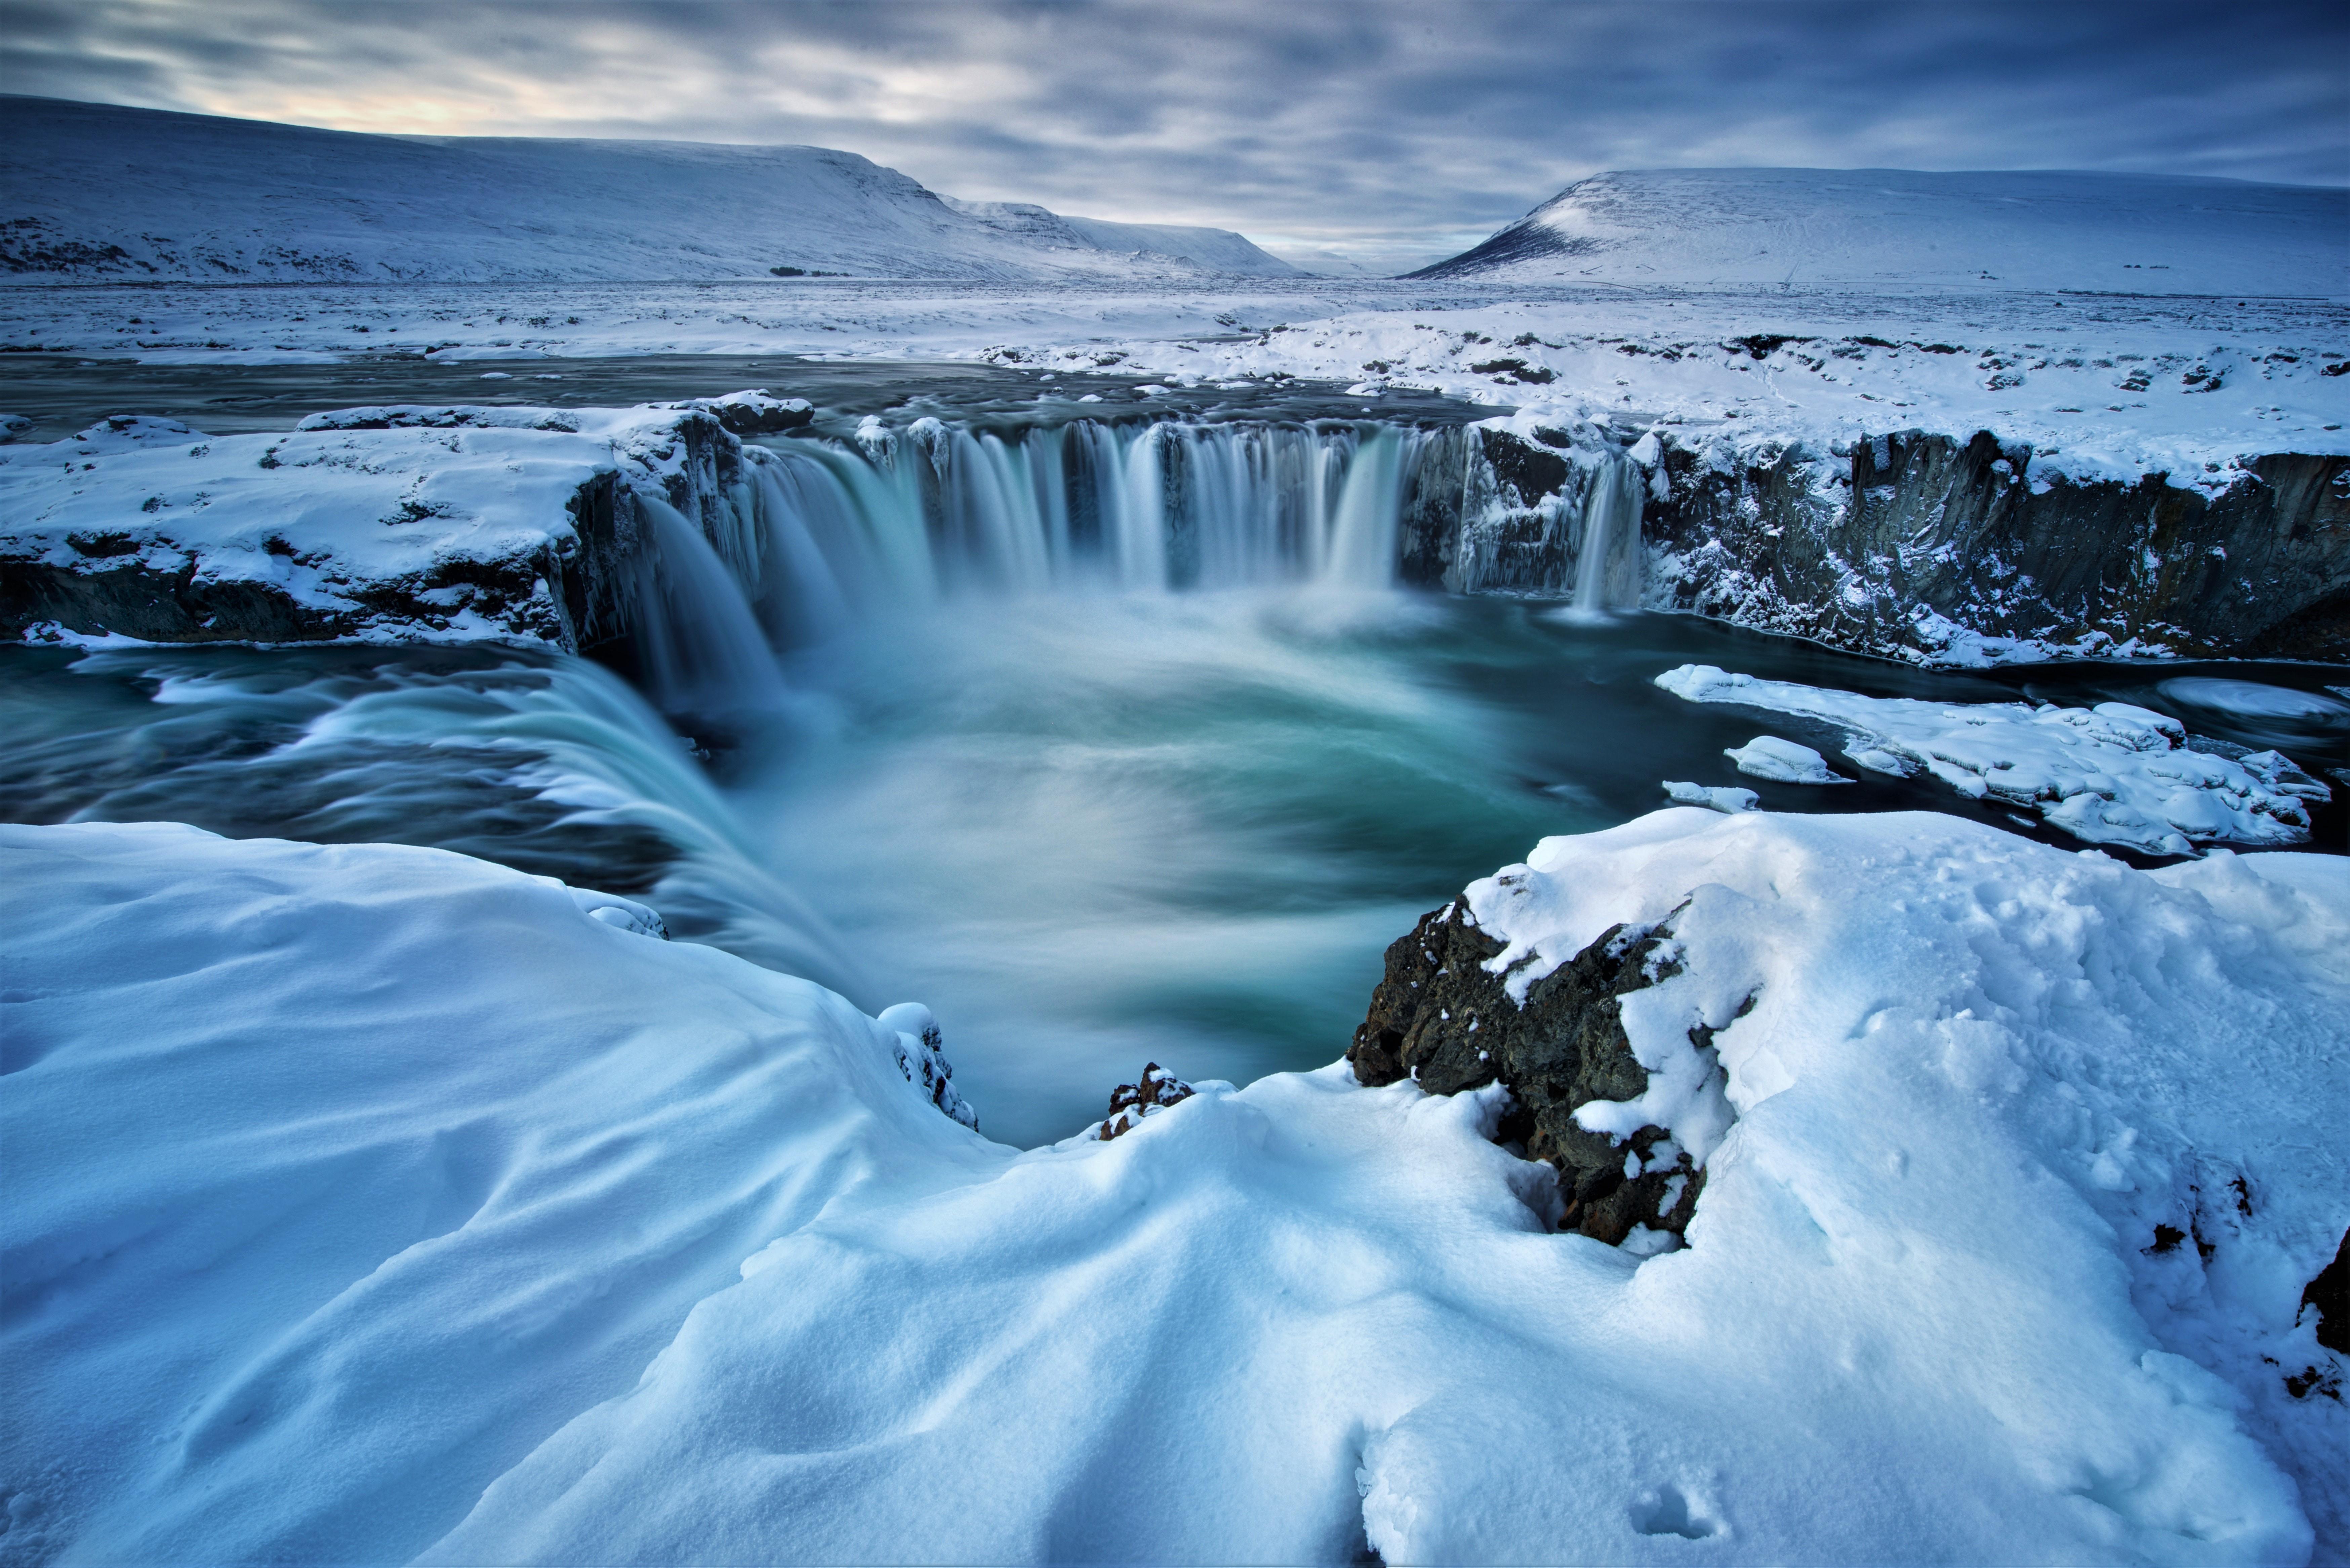 Niagara Falls At Night Wallpaper Hd Wallpaper Godafoss Waterfall Winter Iceland 5k Nature